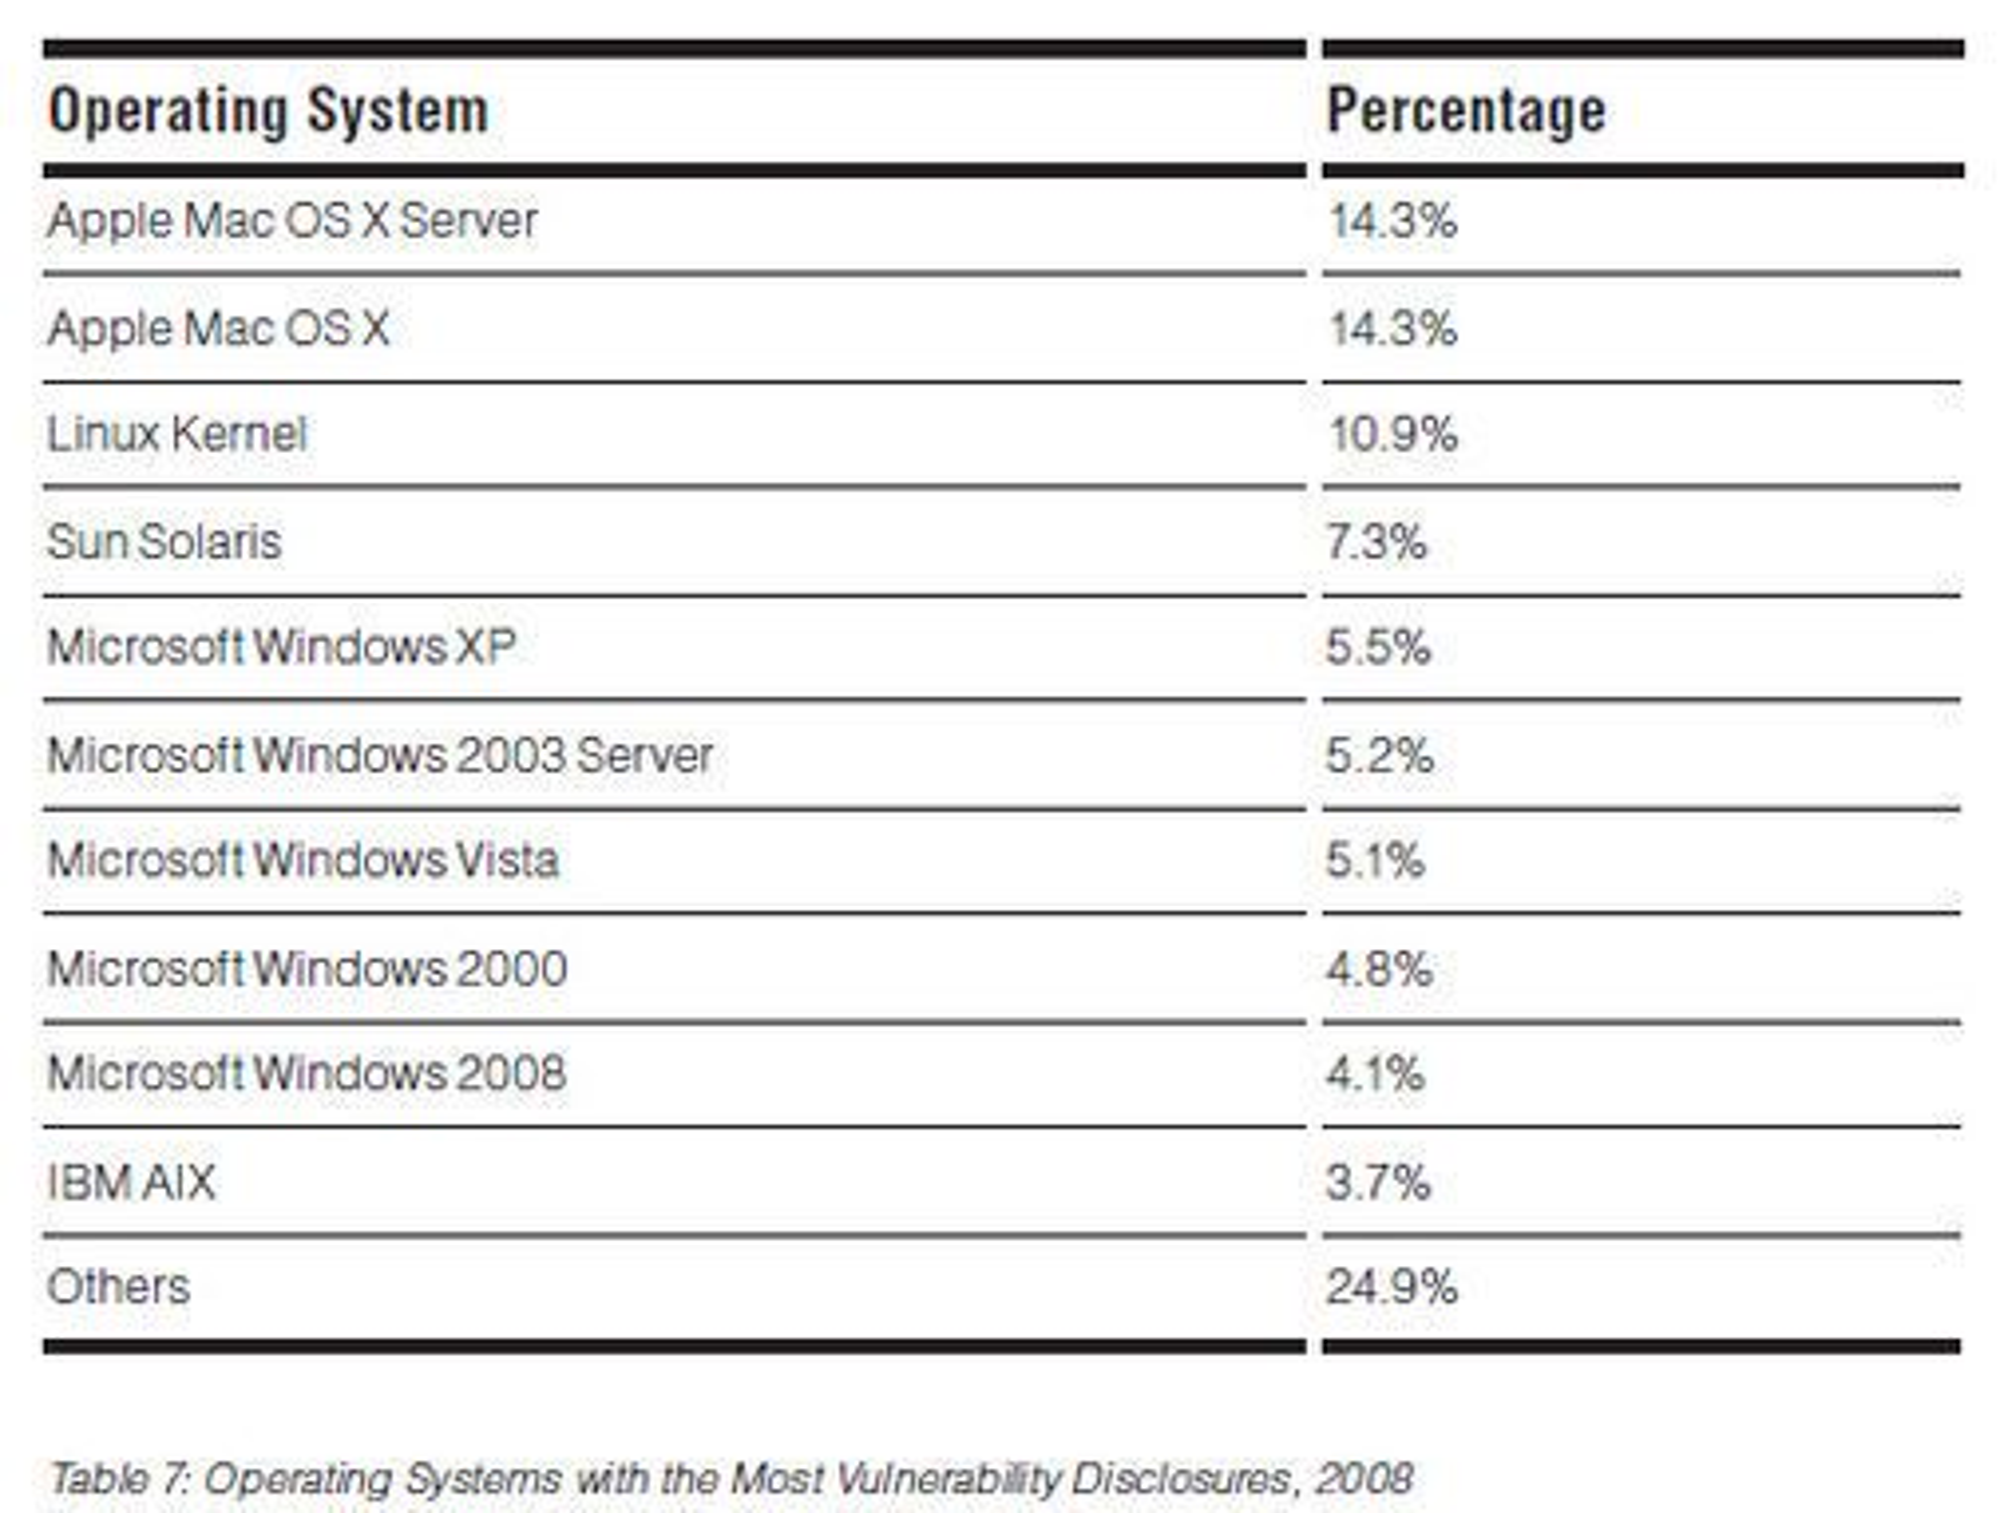 Operativsystemer med flest sårbarheter i 2008